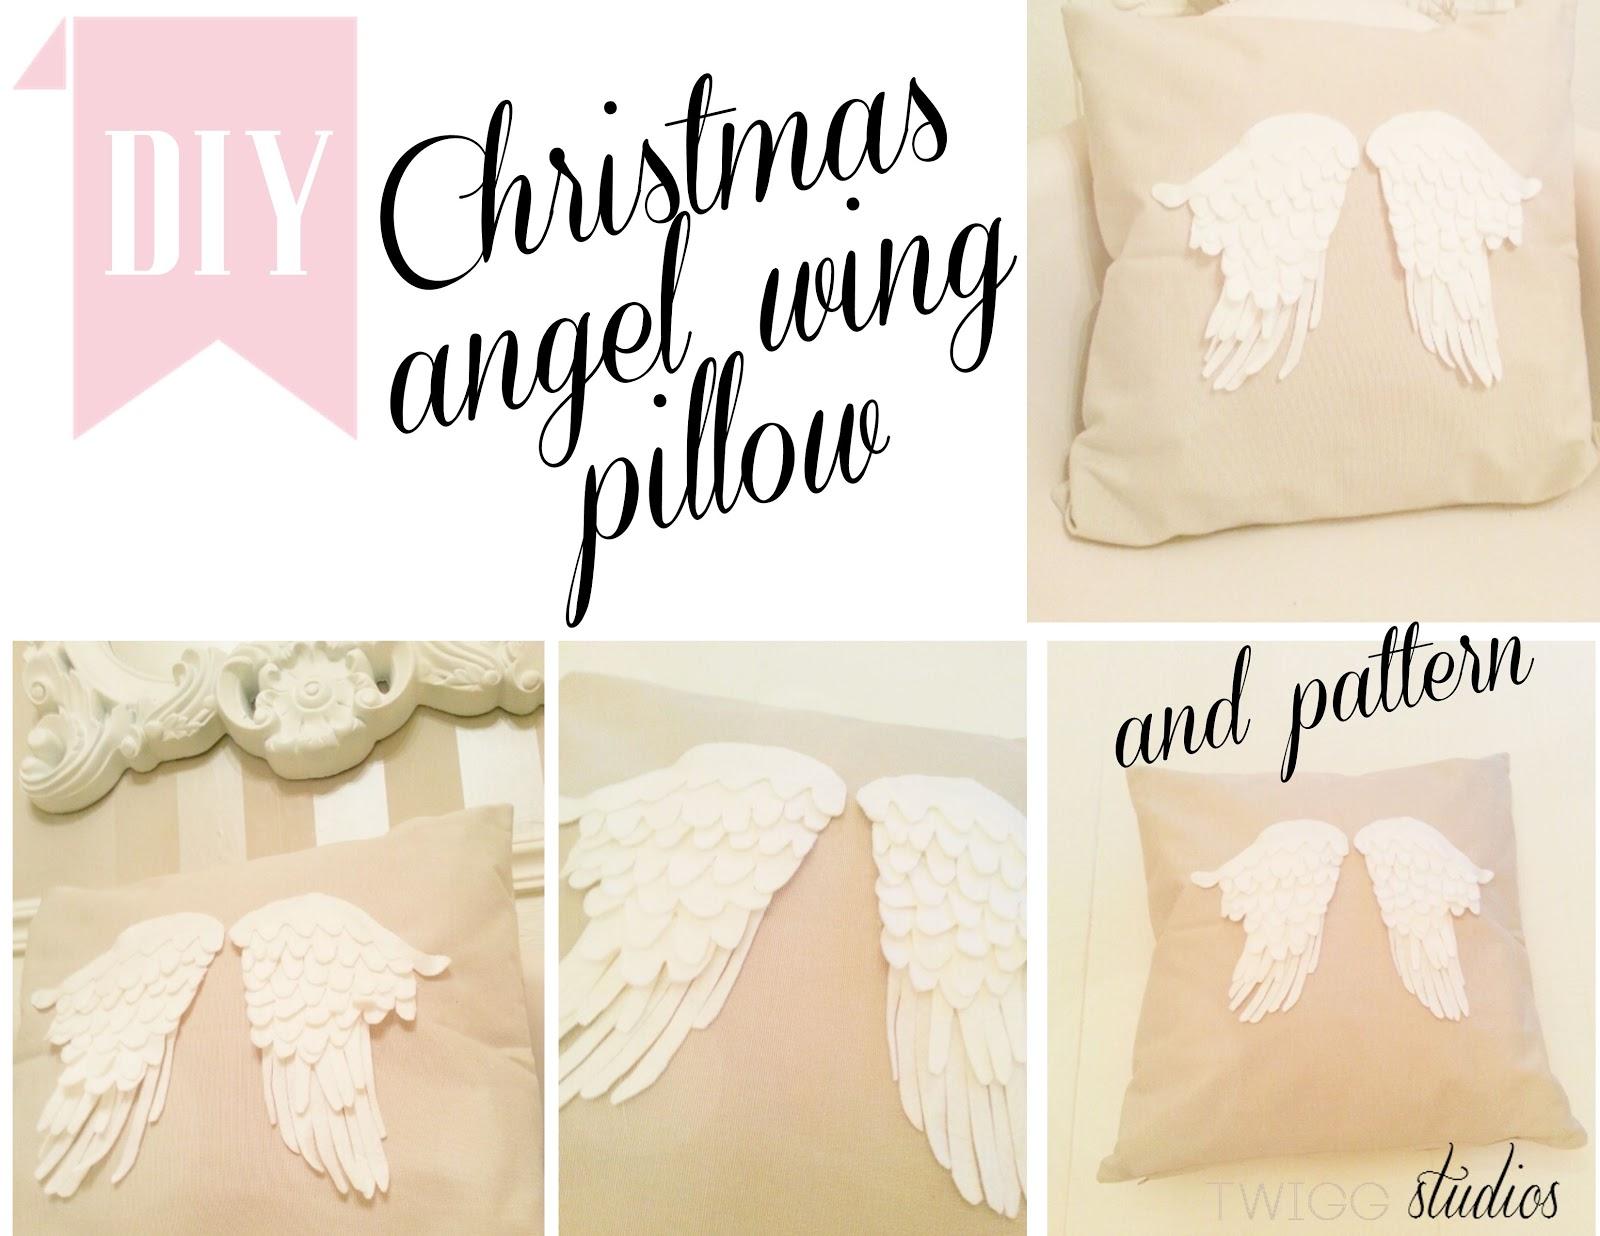 angel wing pillow - twigg studios